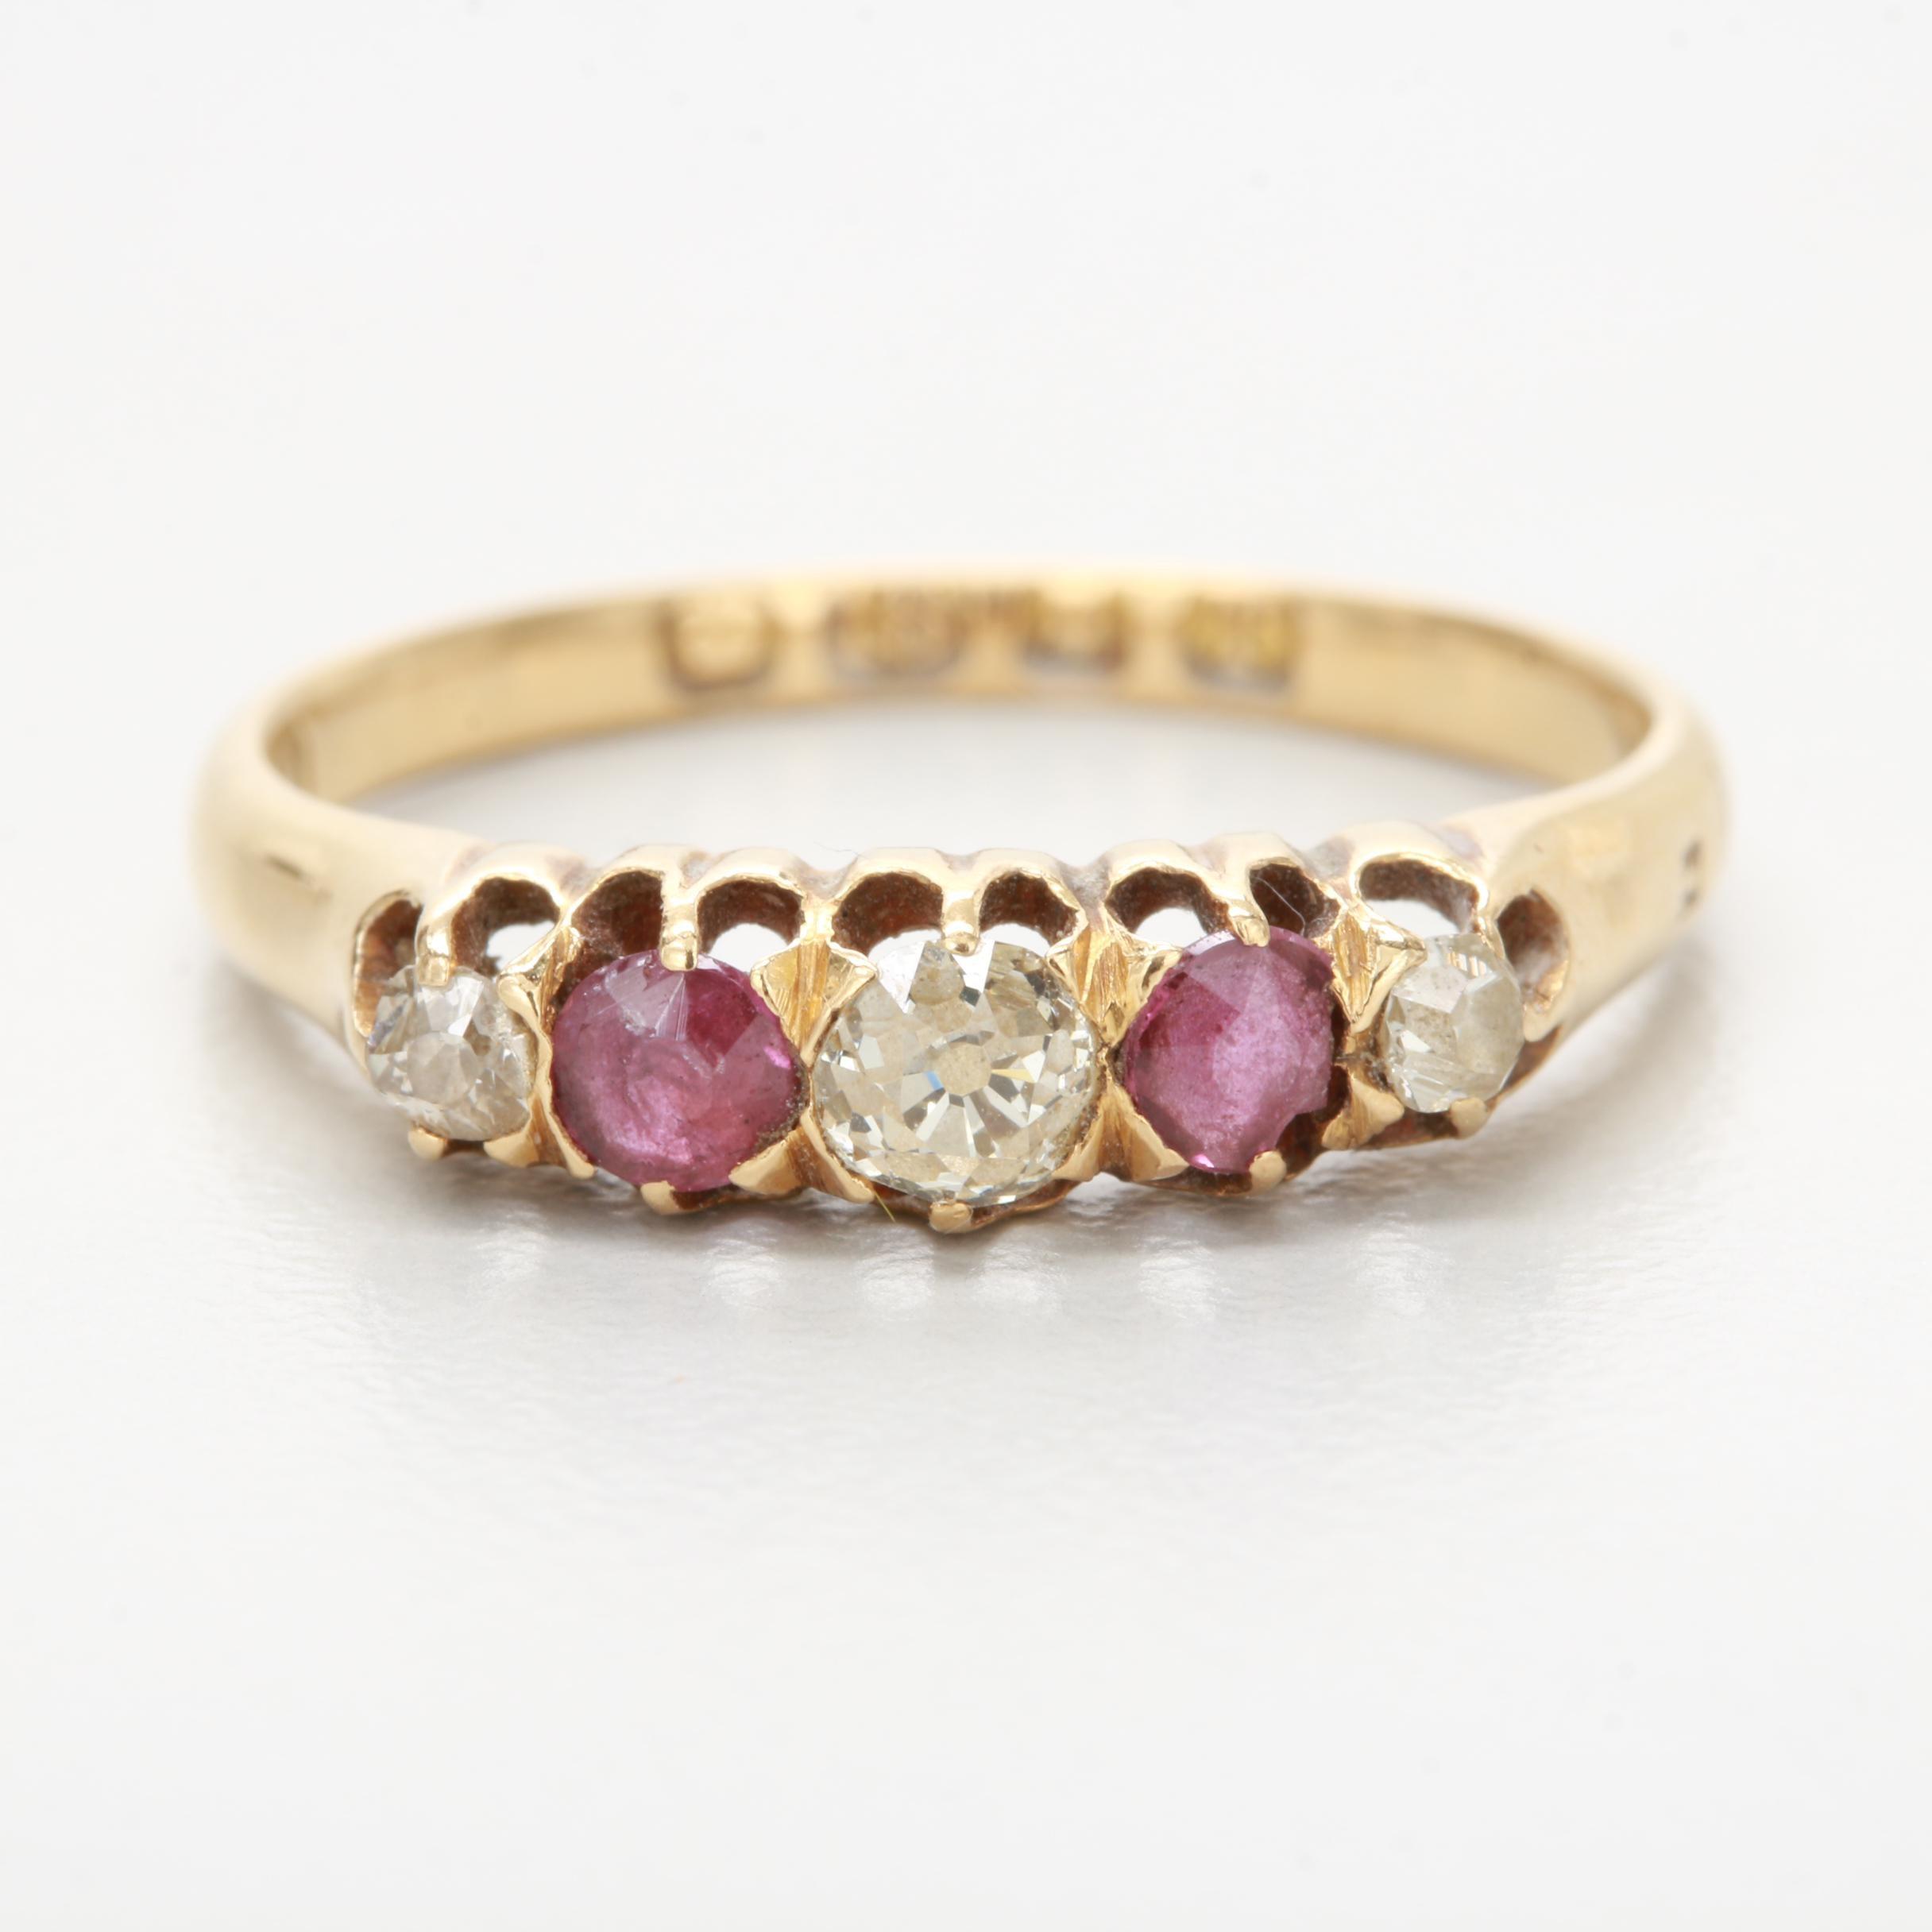 Georgian 18K Yellow Gold Ruby and Old European Cut Diamond Ring